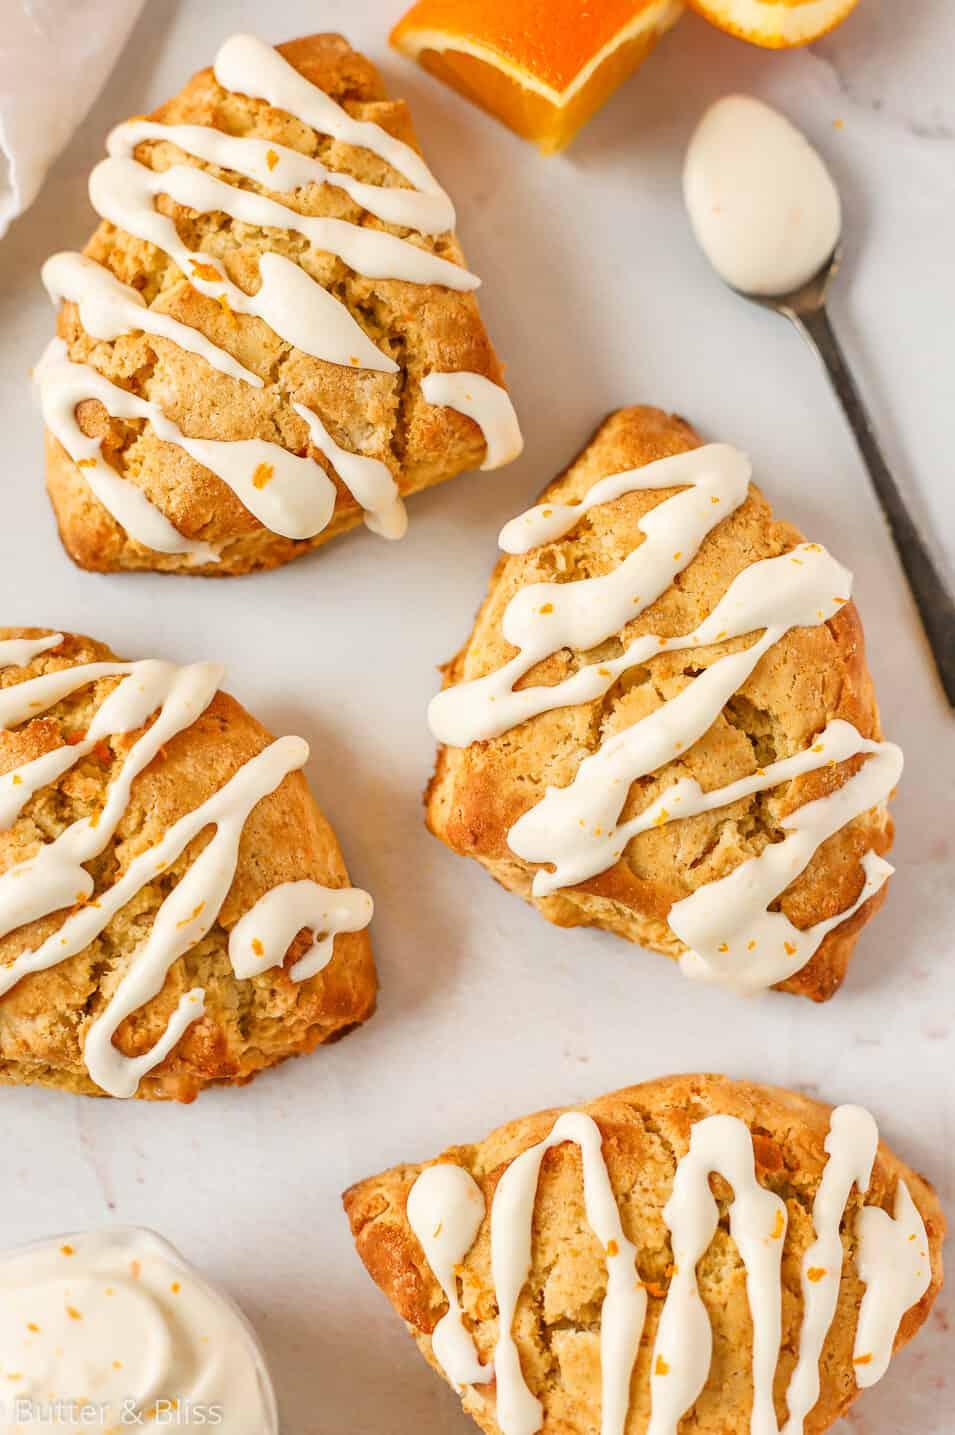 Orange scones with creamy icing